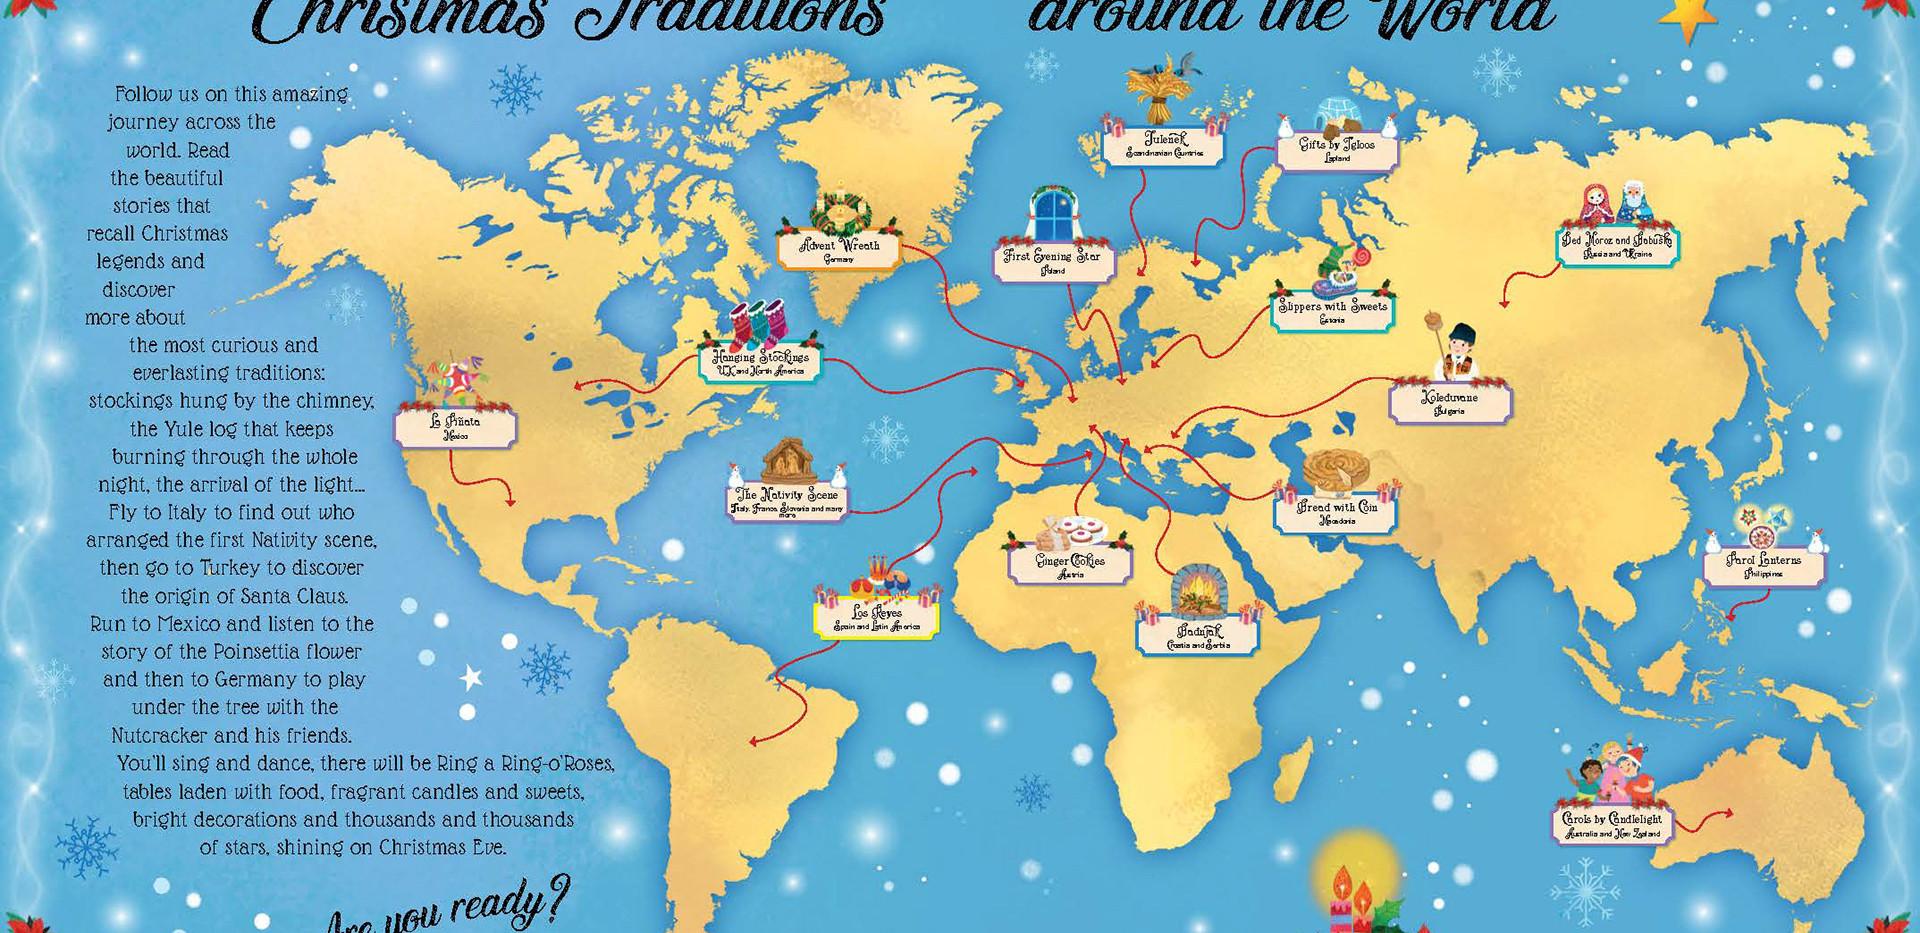 Internal Map od Christmas traditions around the World